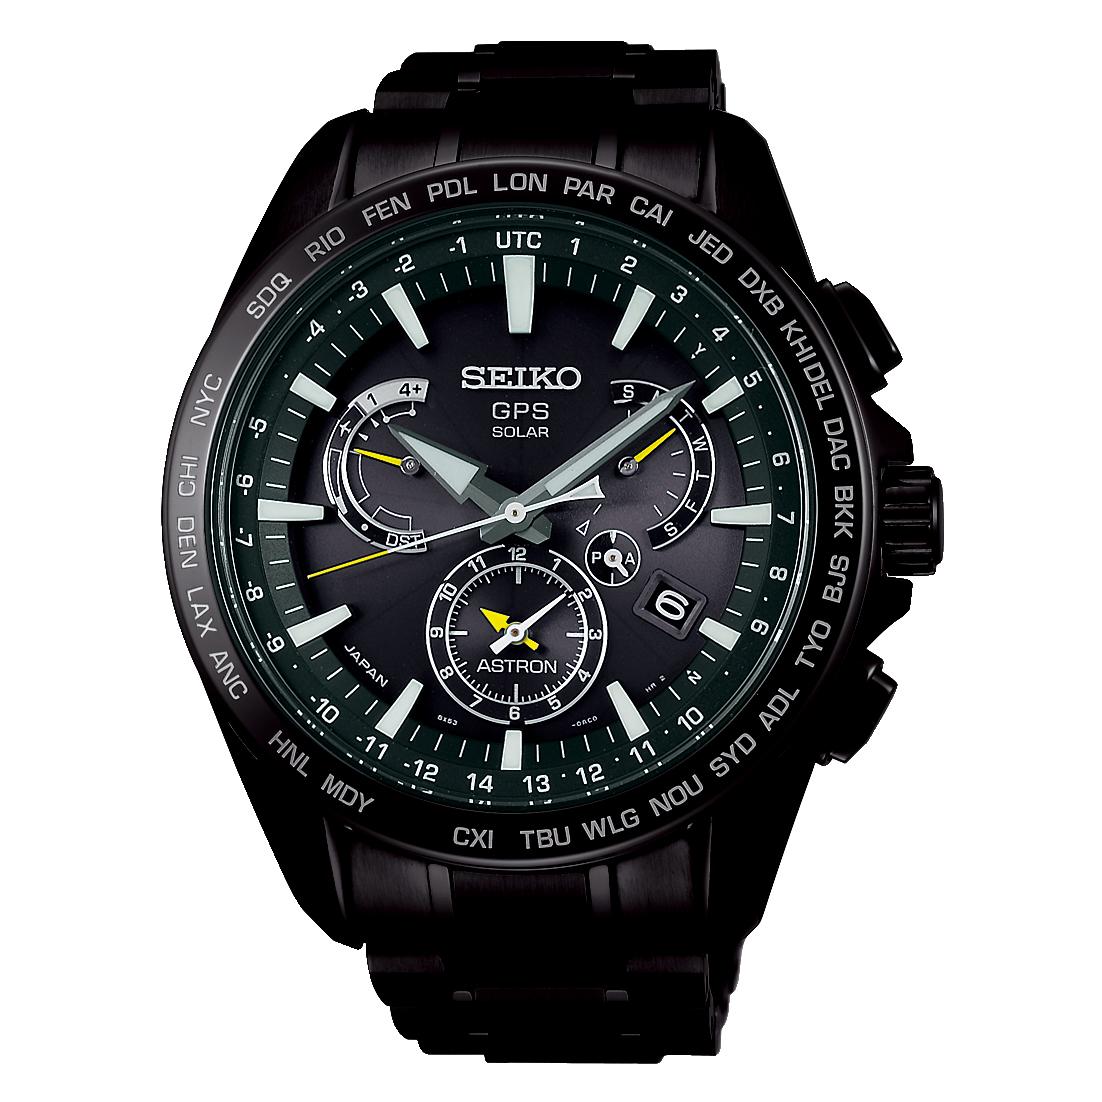 SEIKO ASTRON/セイコー アストロン SBXB079 8X Series Dual-Time デュアルタイム 8X53 Stainless Steel Models ステンレススチールモデル